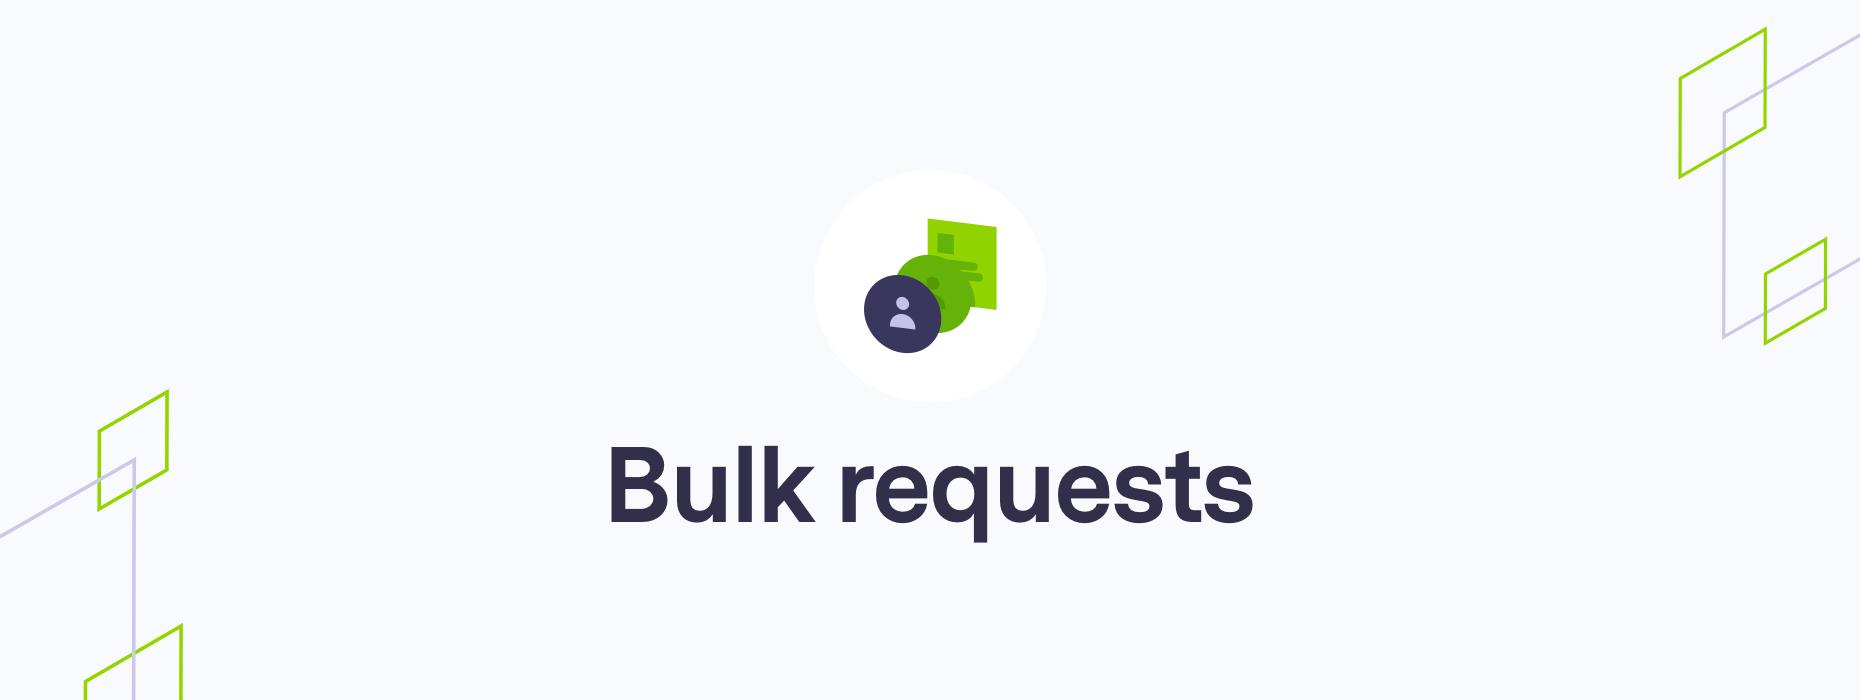 Bulk requests